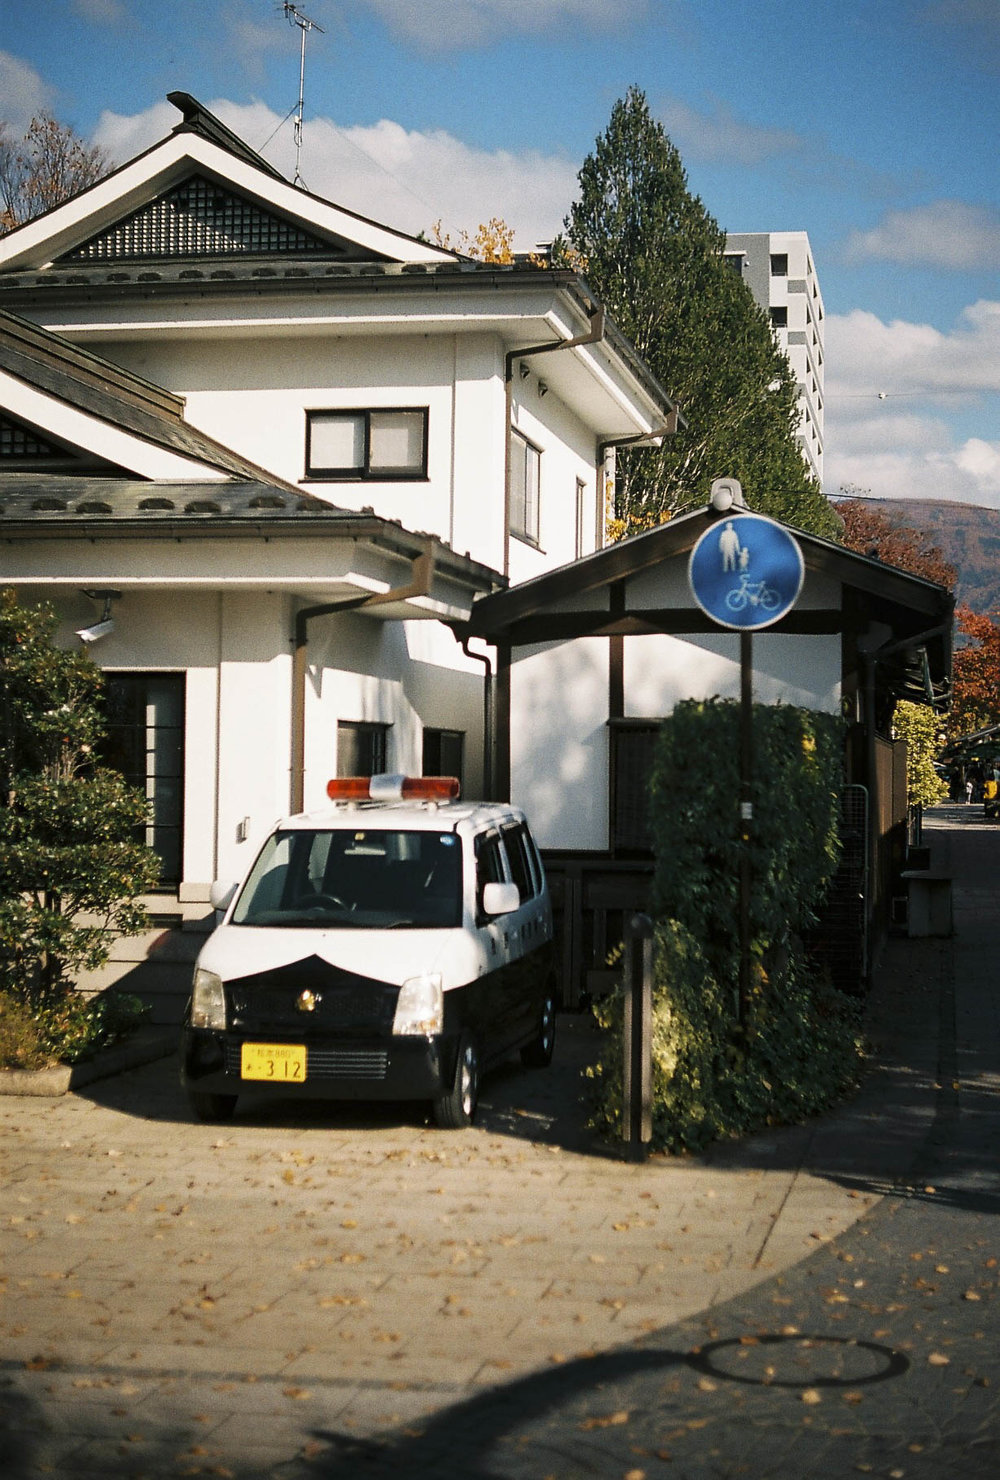 BDAY_LA_JAPAN_SNAP_LQ_199.JPG